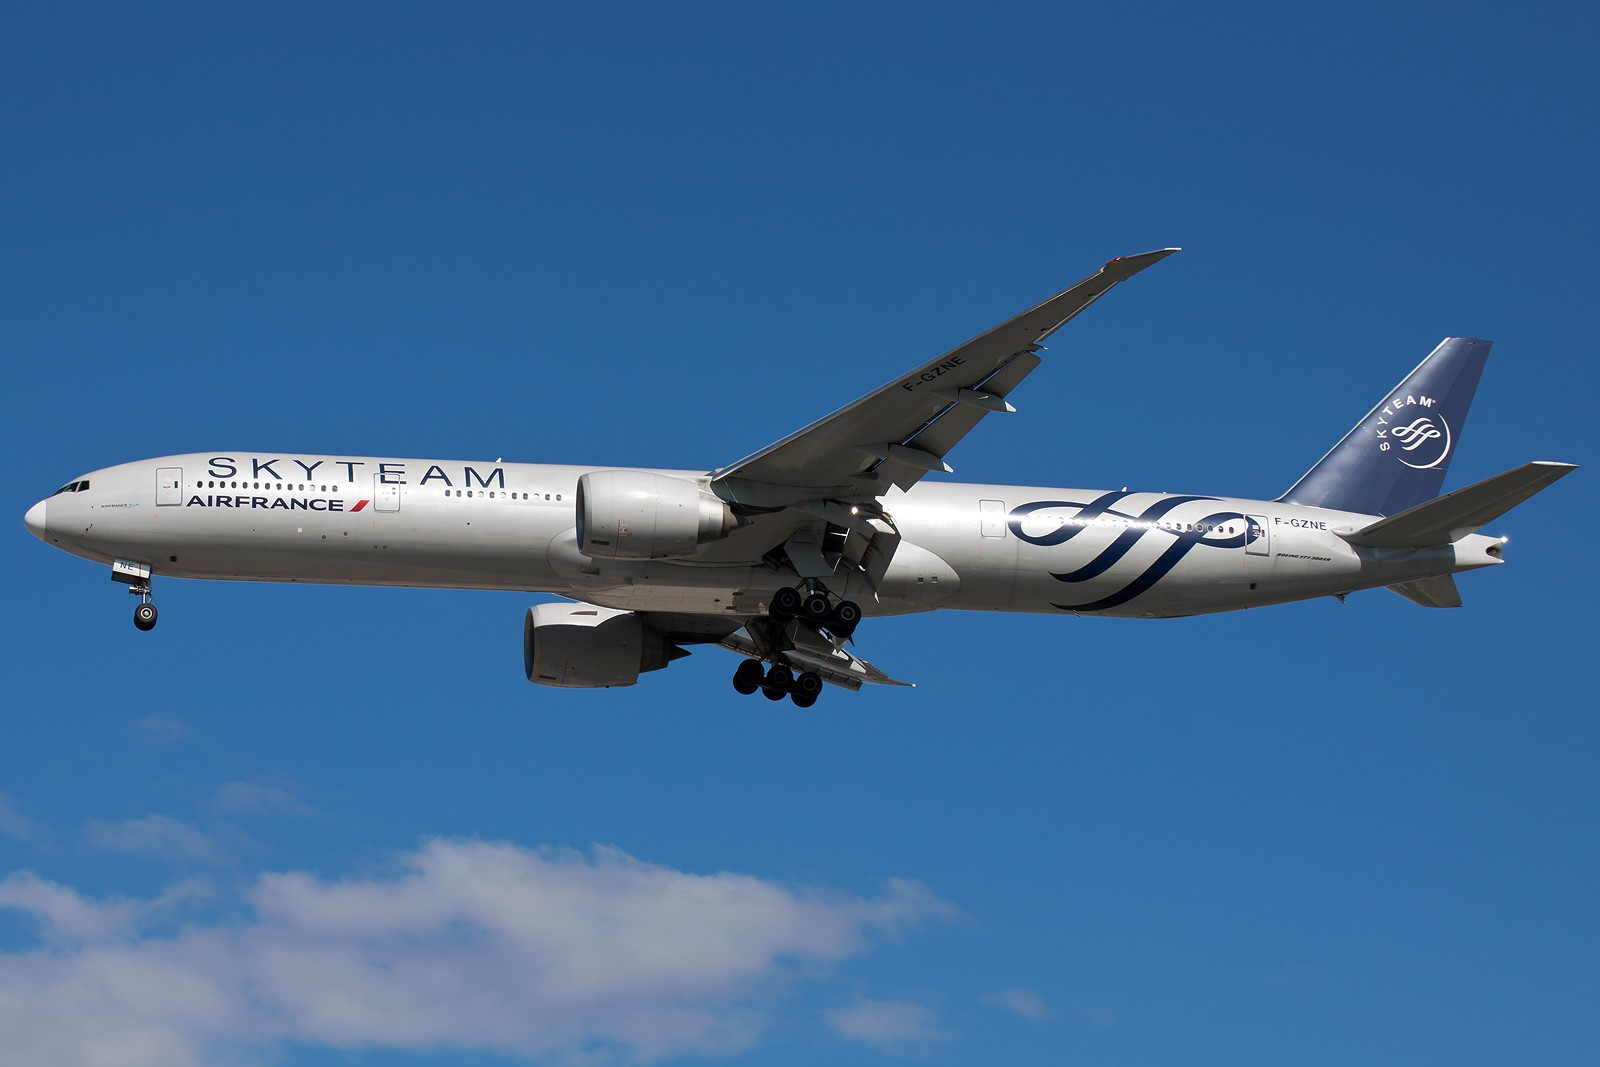 Re:[原创]求好天儿... [10pics] BOEING 777-300ER F-GZNE 中国北京首都国际机场